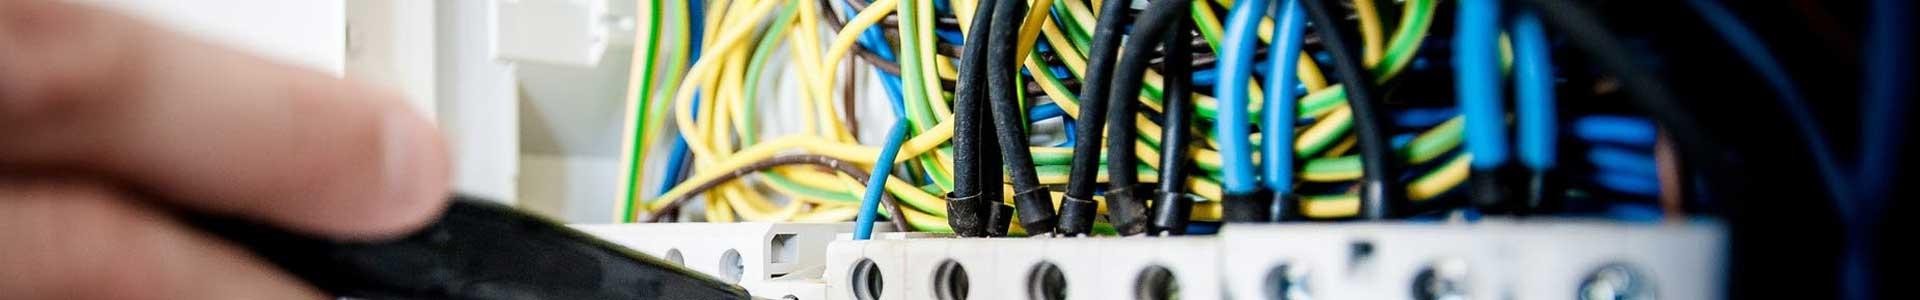 Elektronikzubehör